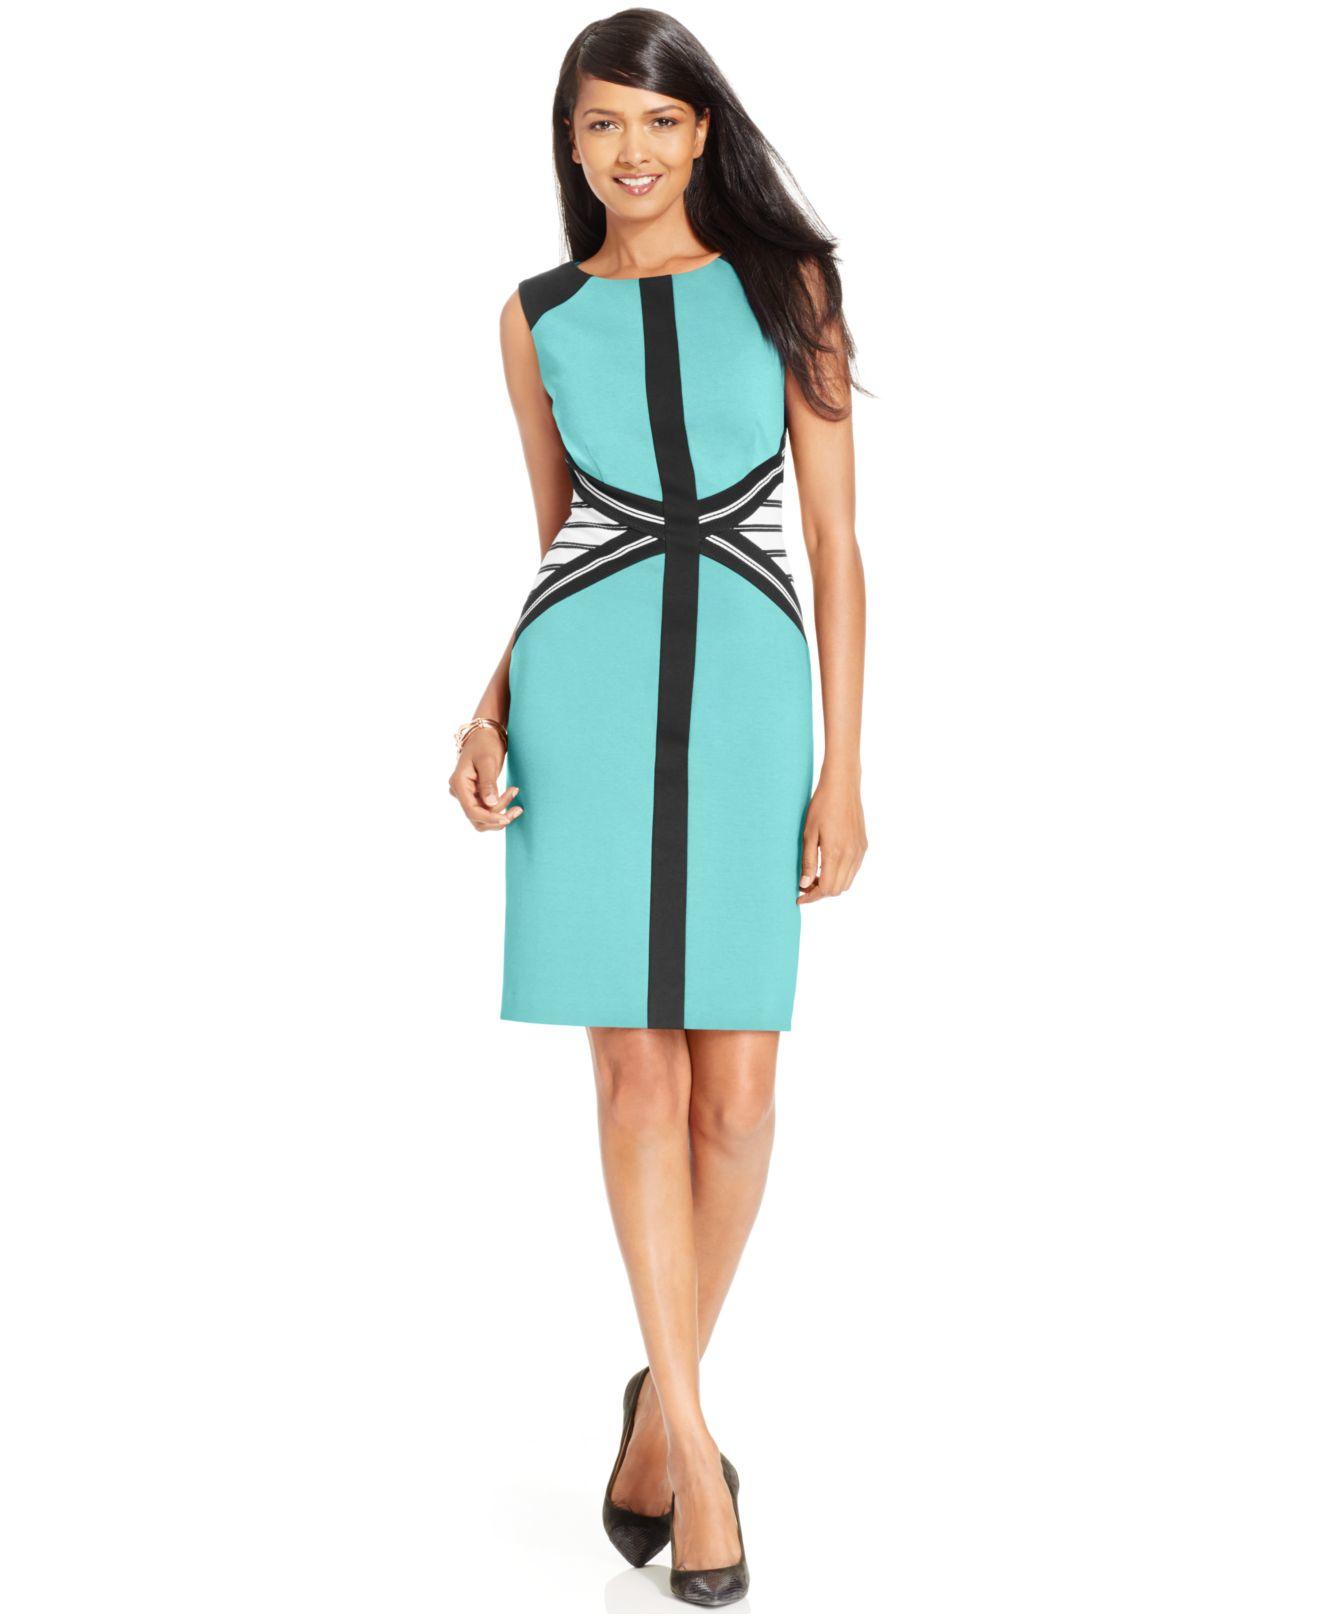 Lyst - Ivanka Trump Sleeveless Colorblocked Sheath Dress in Blue